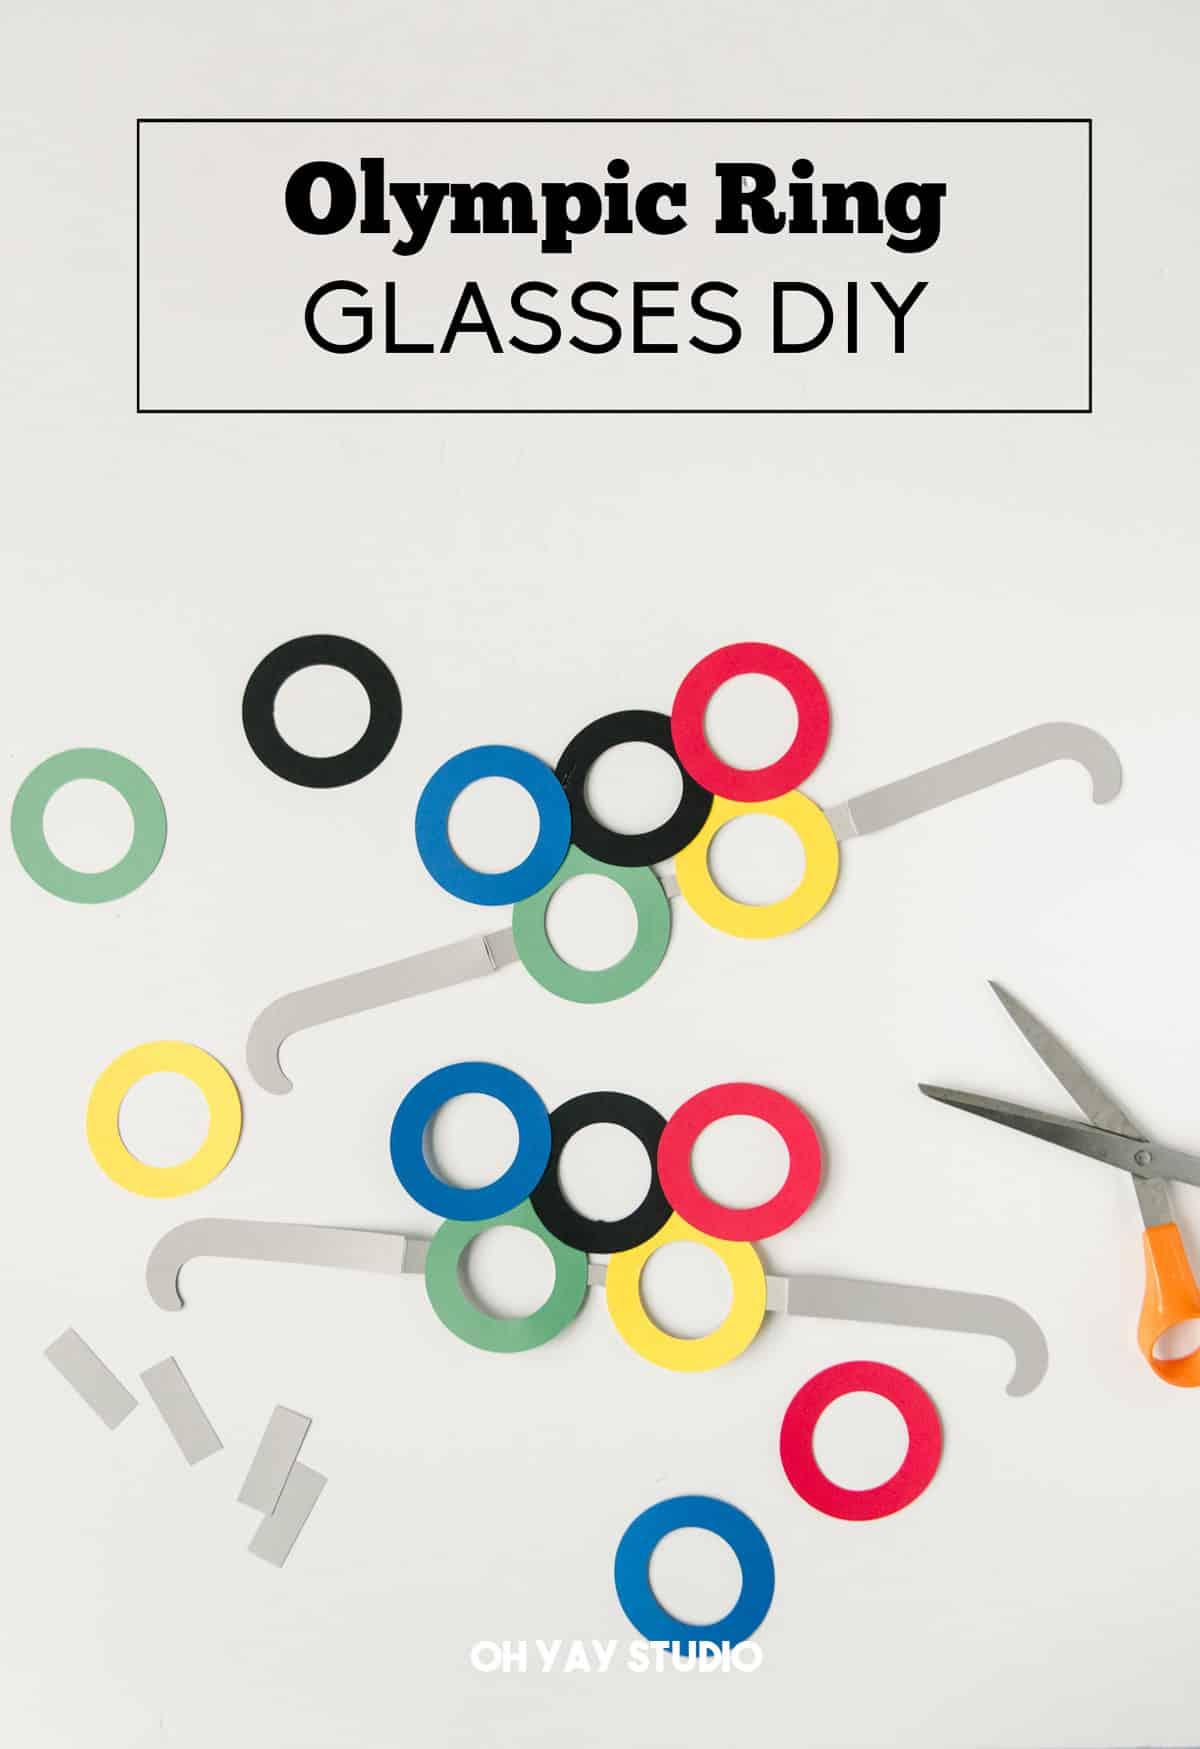 Olympic-Glasses-SVG-oh-yay-studio-22